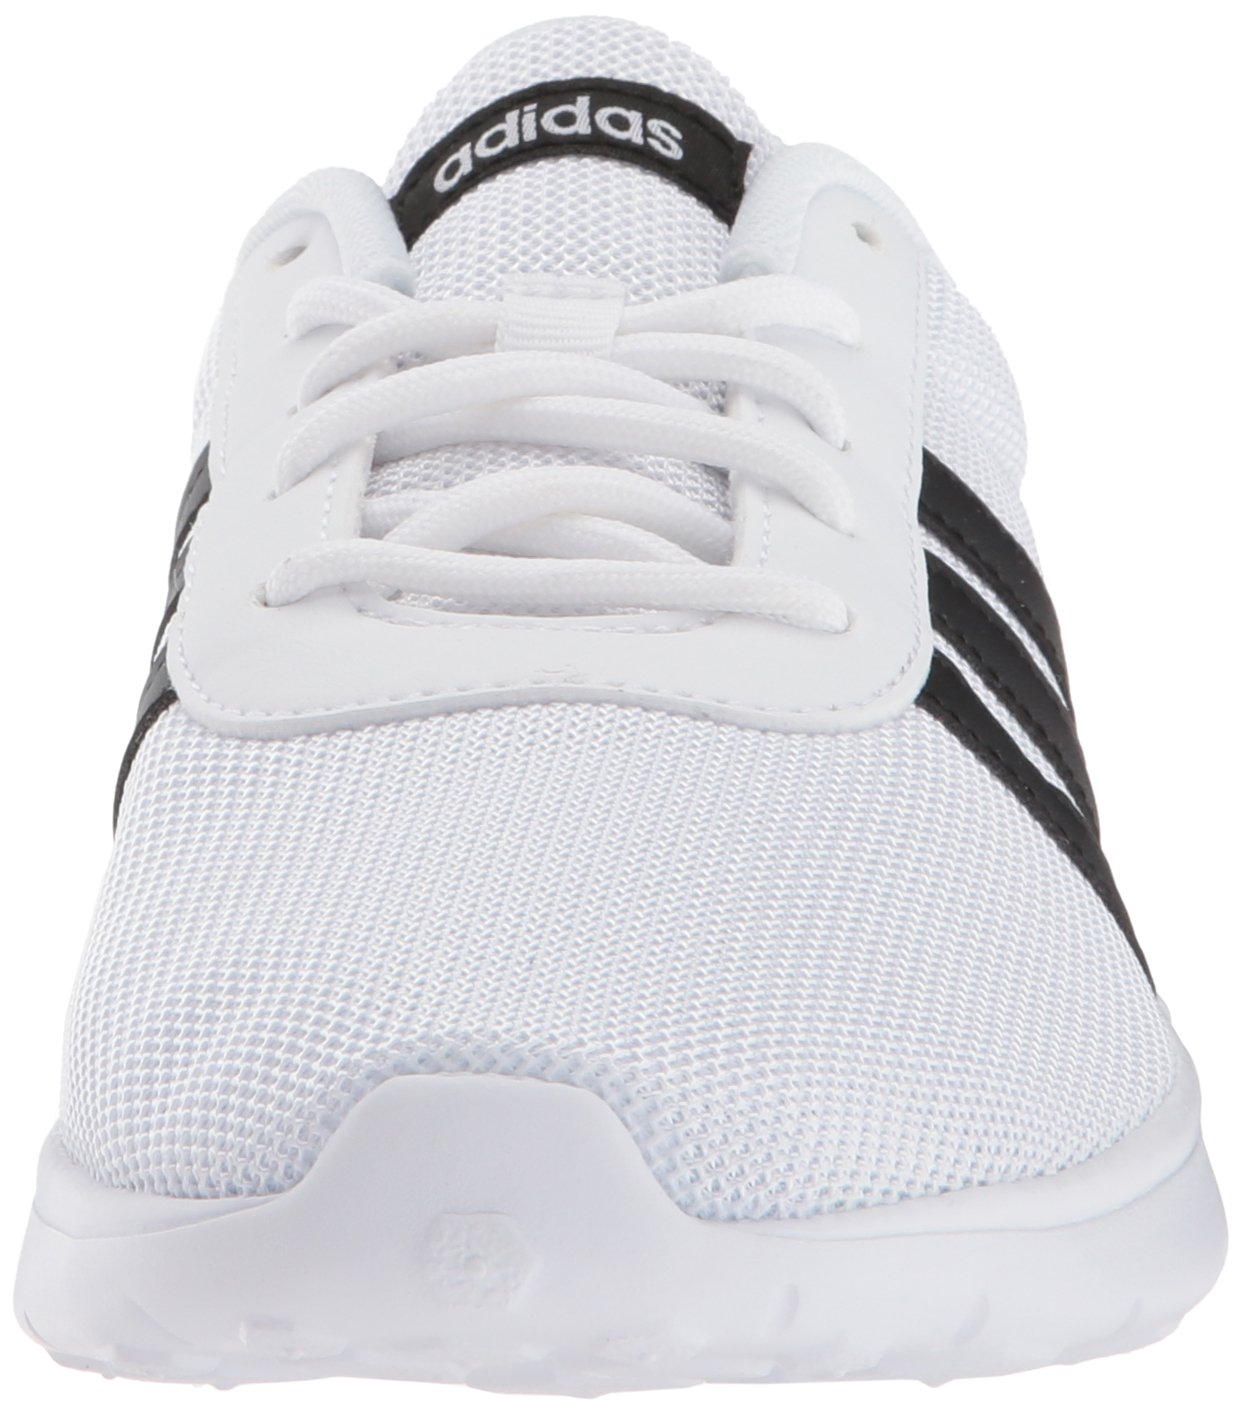 adidas originali donne lite racer scarpa da corsa, amazon